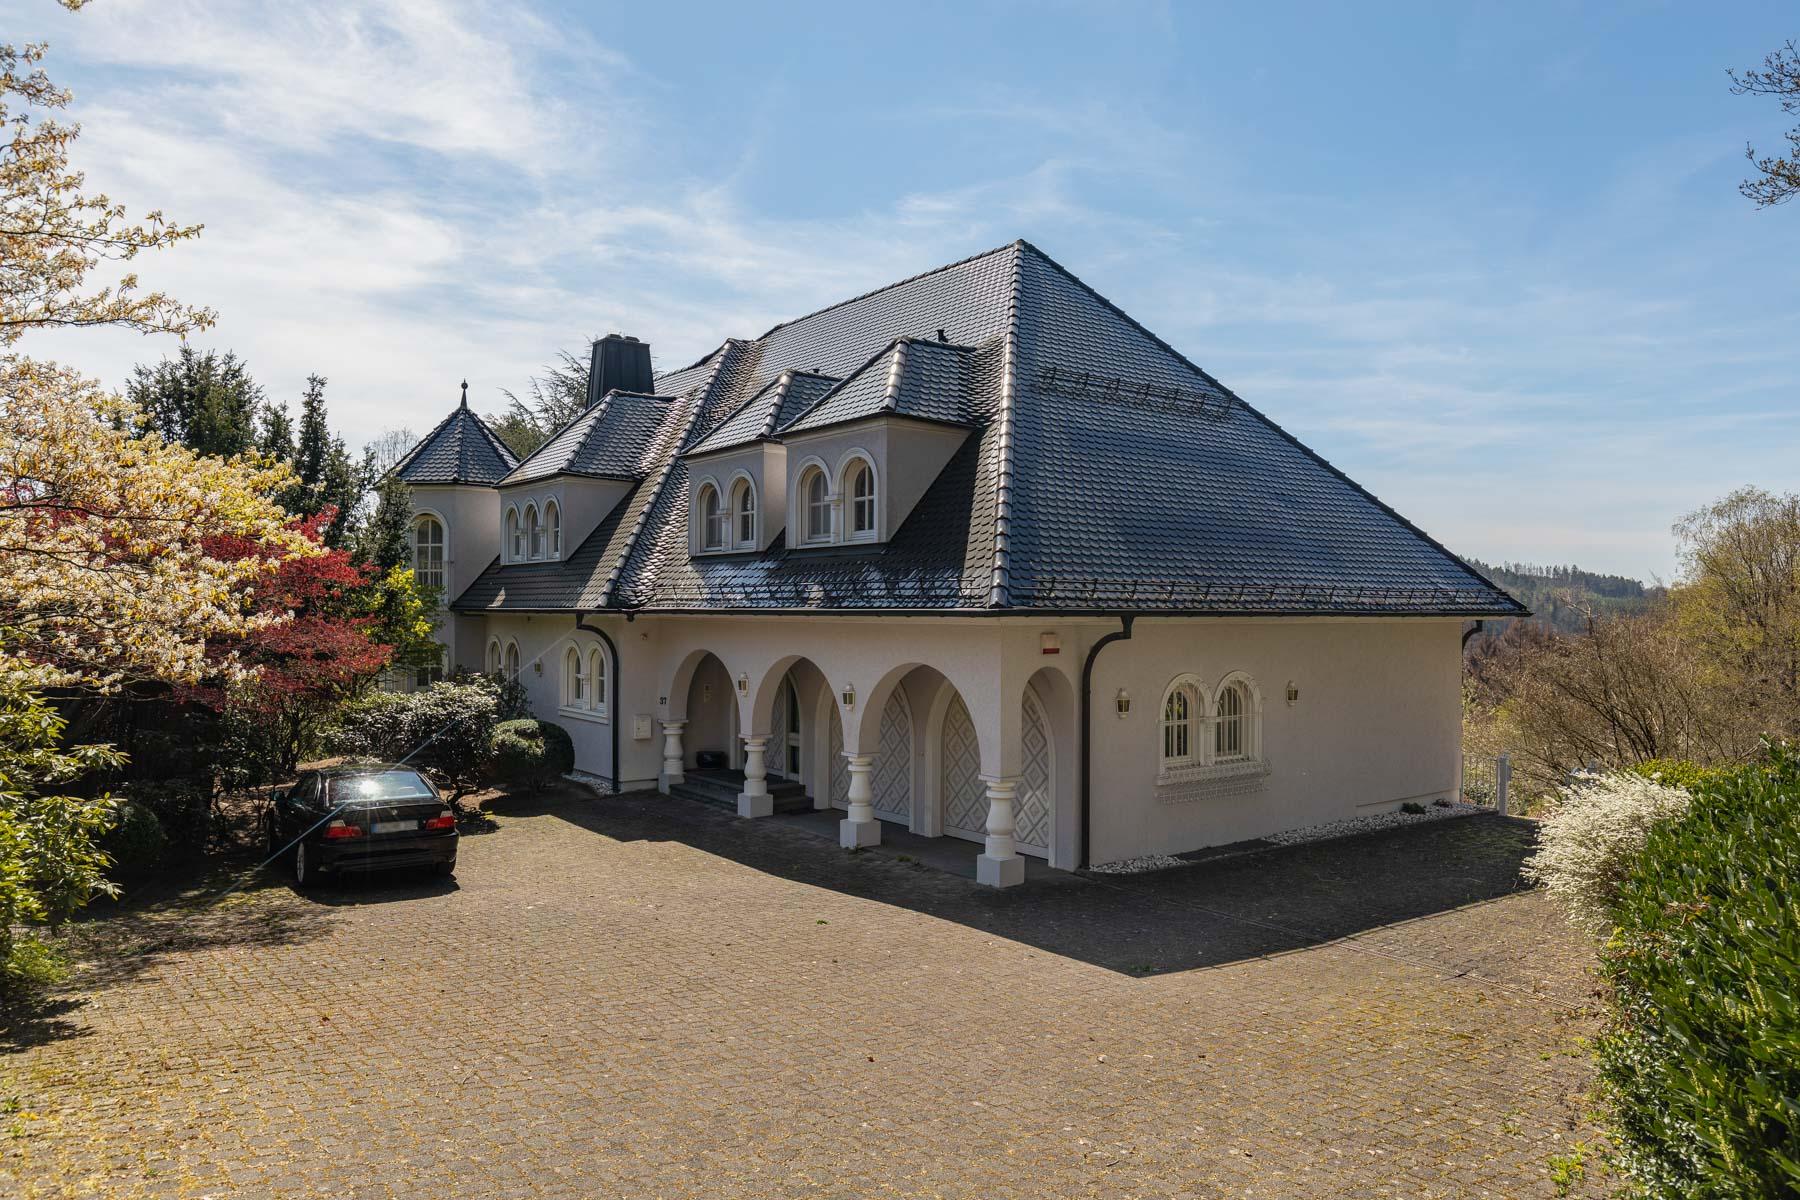 Single Family Homes for Sale at Hermannsburgstr. 37, 51643 Gummersbach Hermannsburgstr. 37 Other North Rhine Westphalia, North Rhine Westphalia 51643 Germany